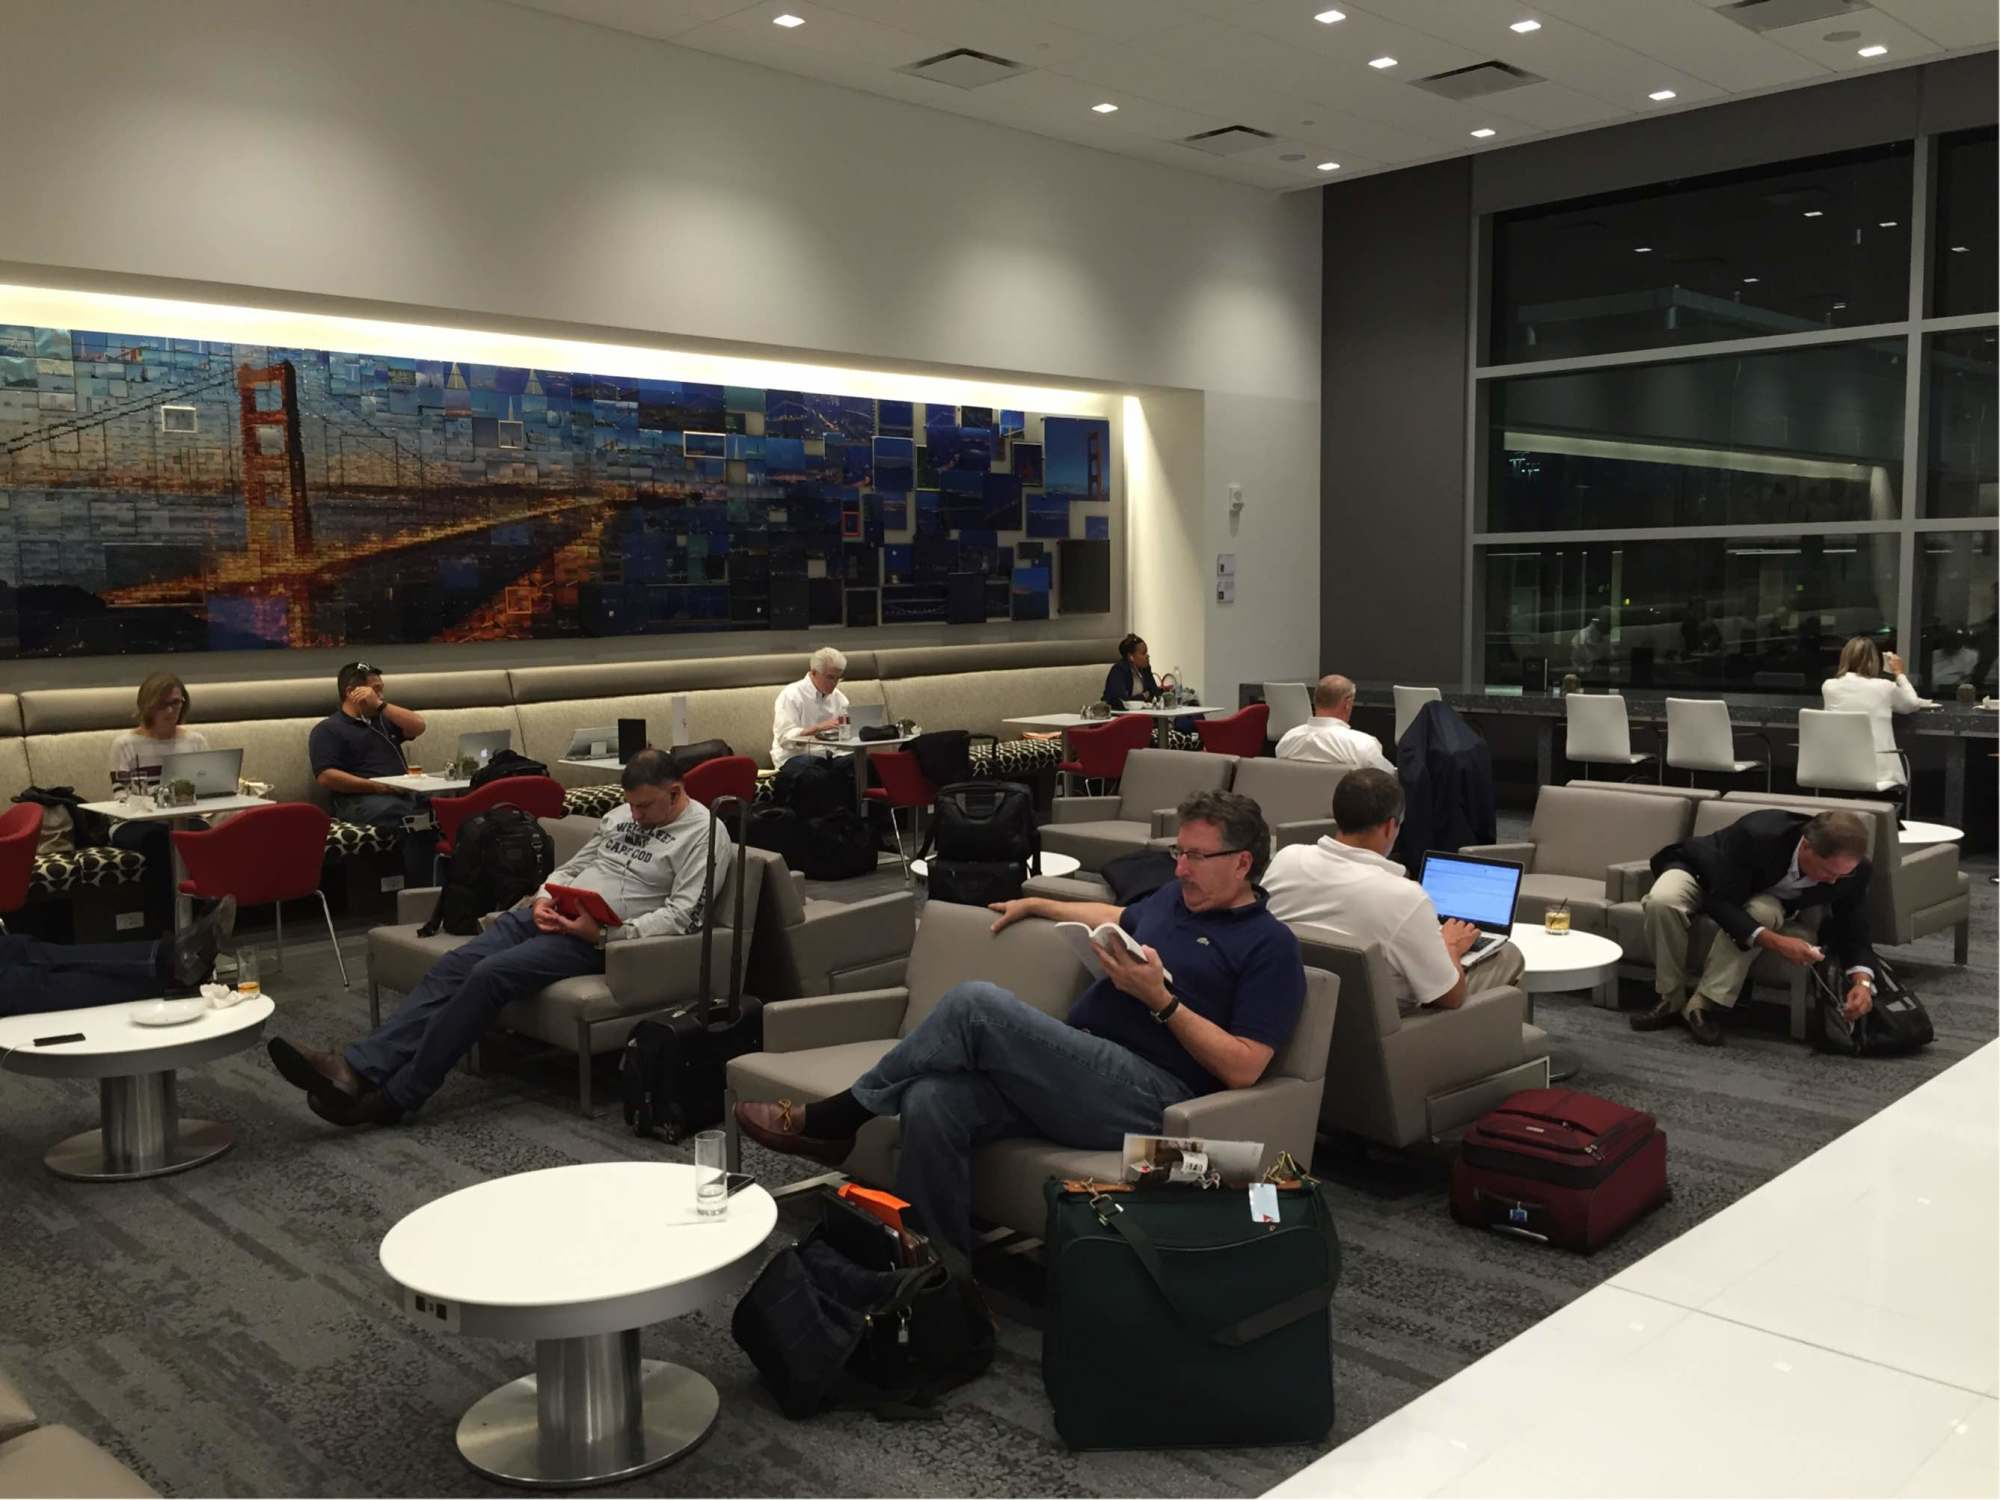 American Express Platinum Customer Service >> SFO: Delta Air Lines Delta Sky Club Reviews & Photos - Terminal 1, San Francisco International ...